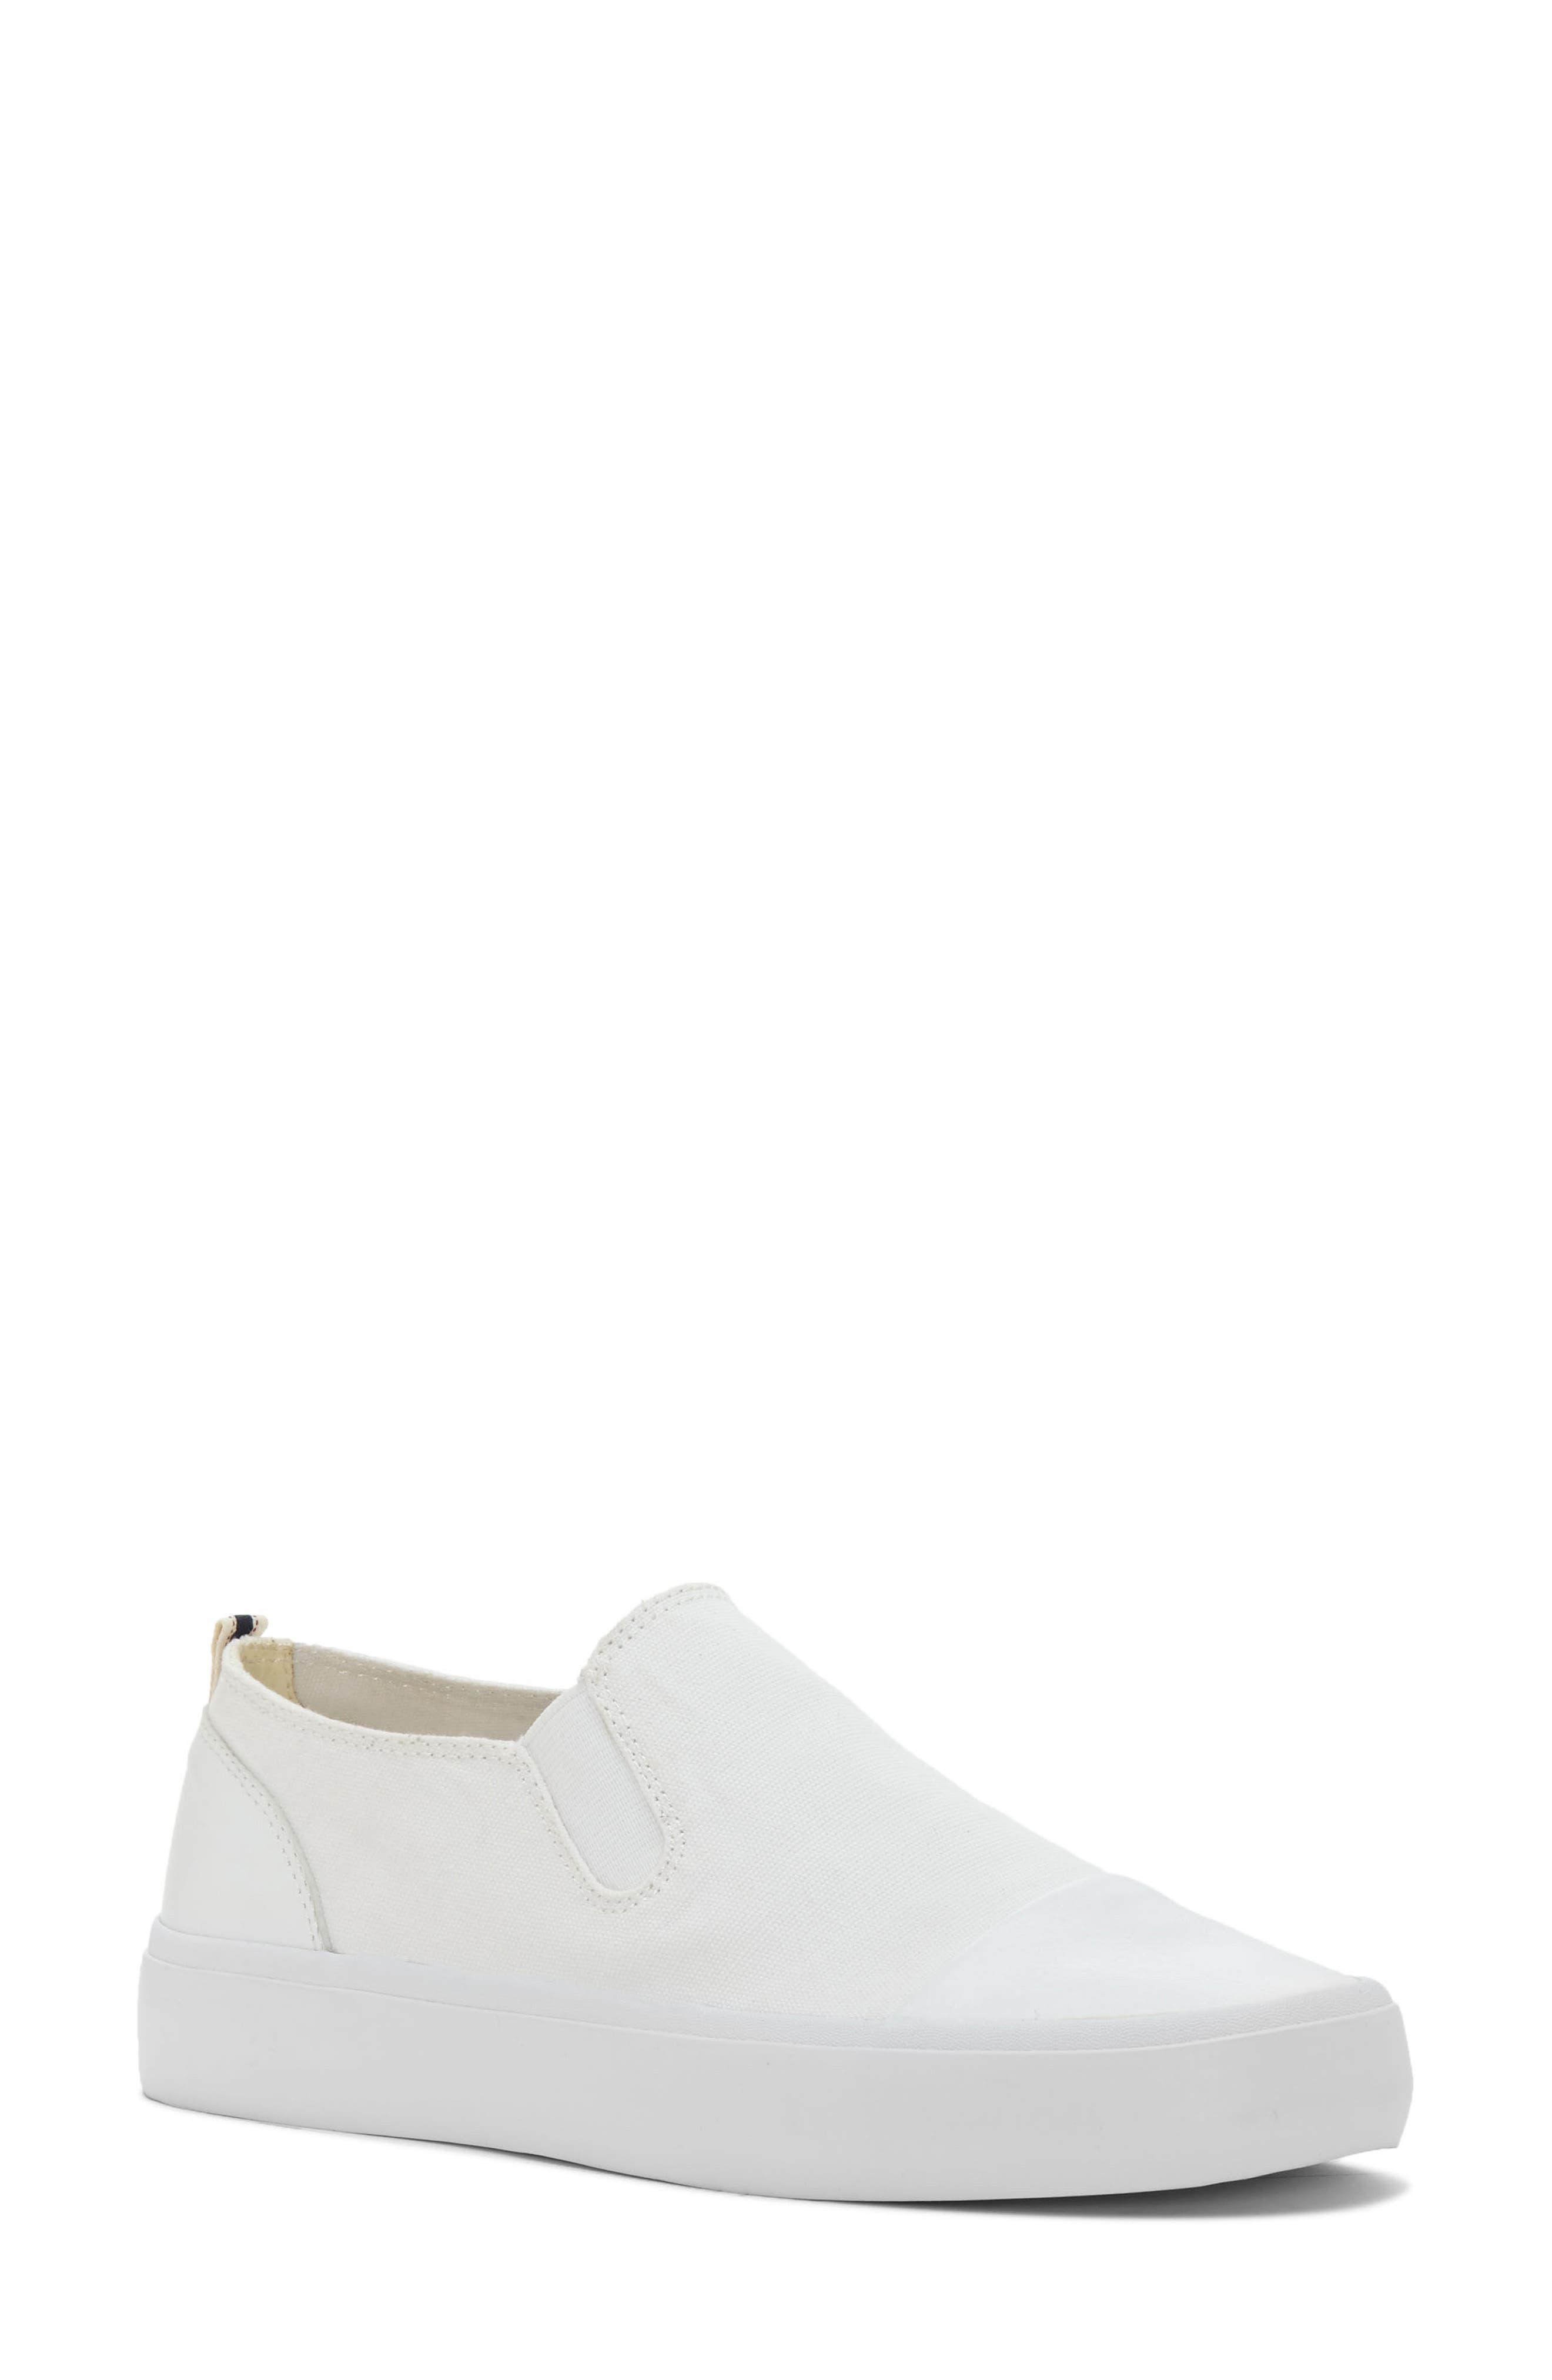 Darja Slip-On Sneaker,                             Main thumbnail 1, color,                             110